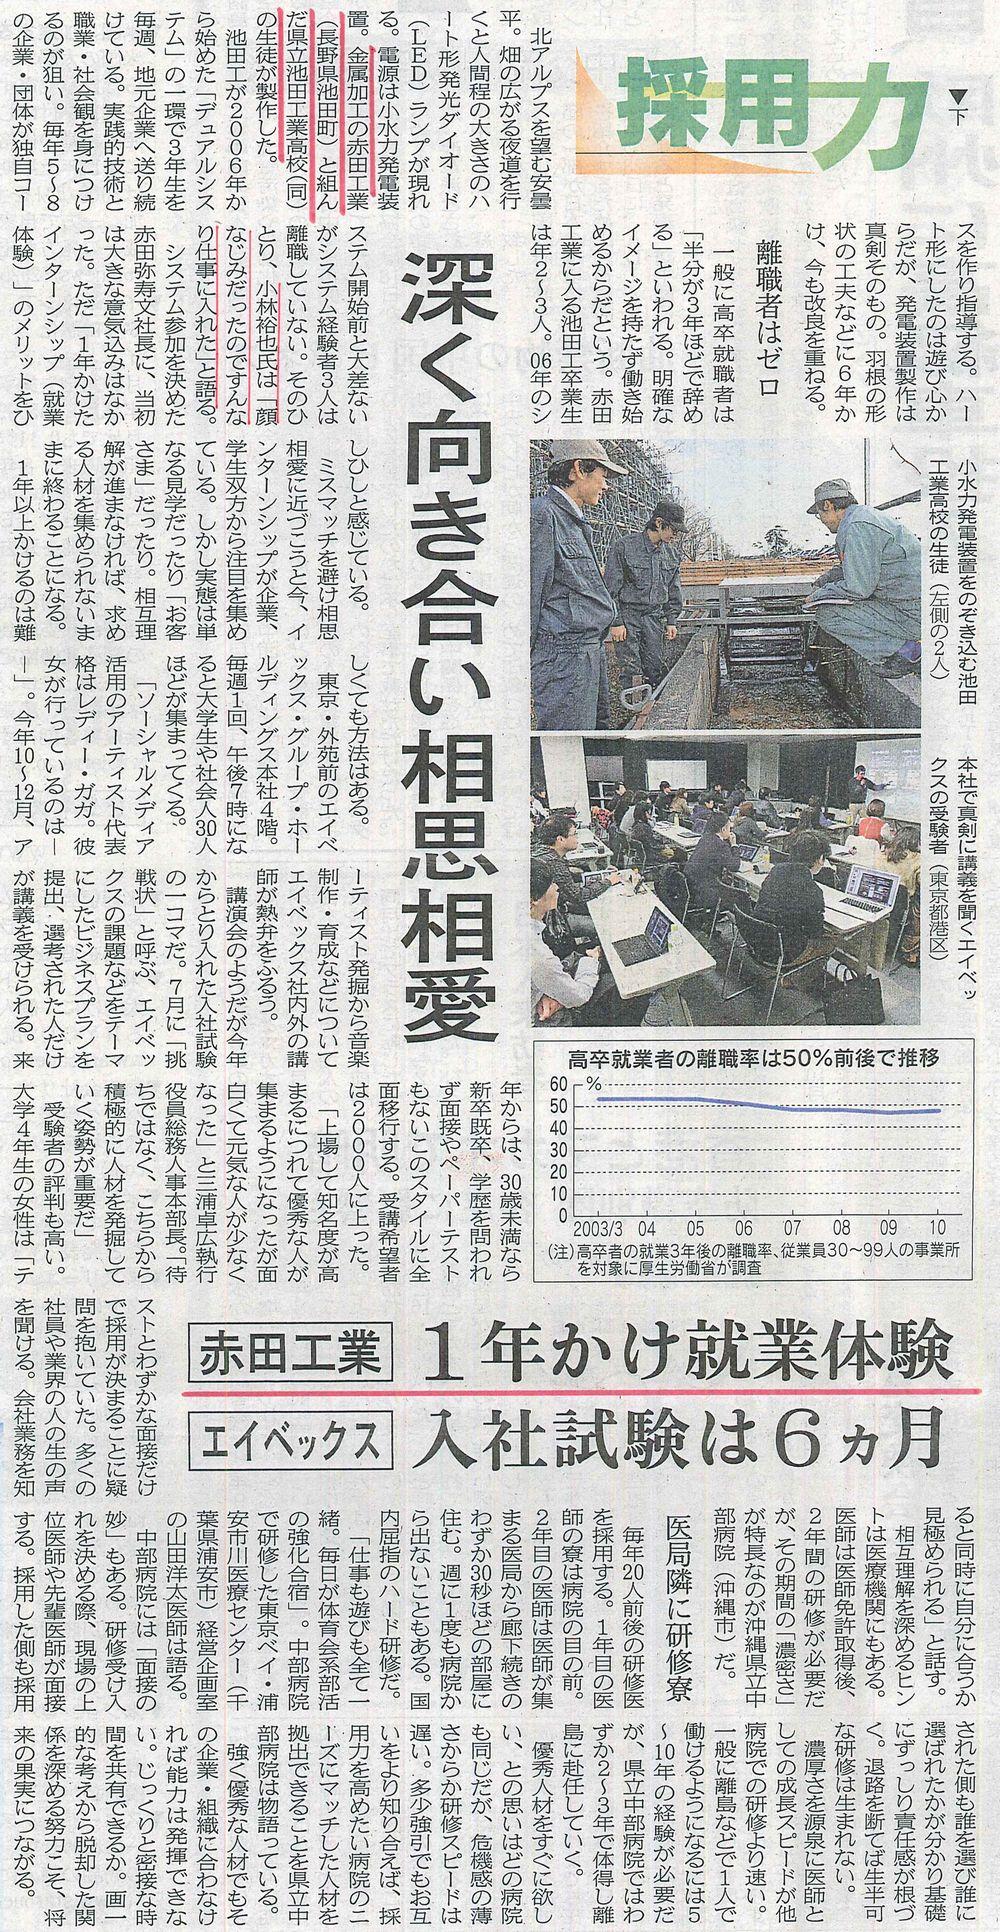 scrap2013.11.28.nikkei.jpg